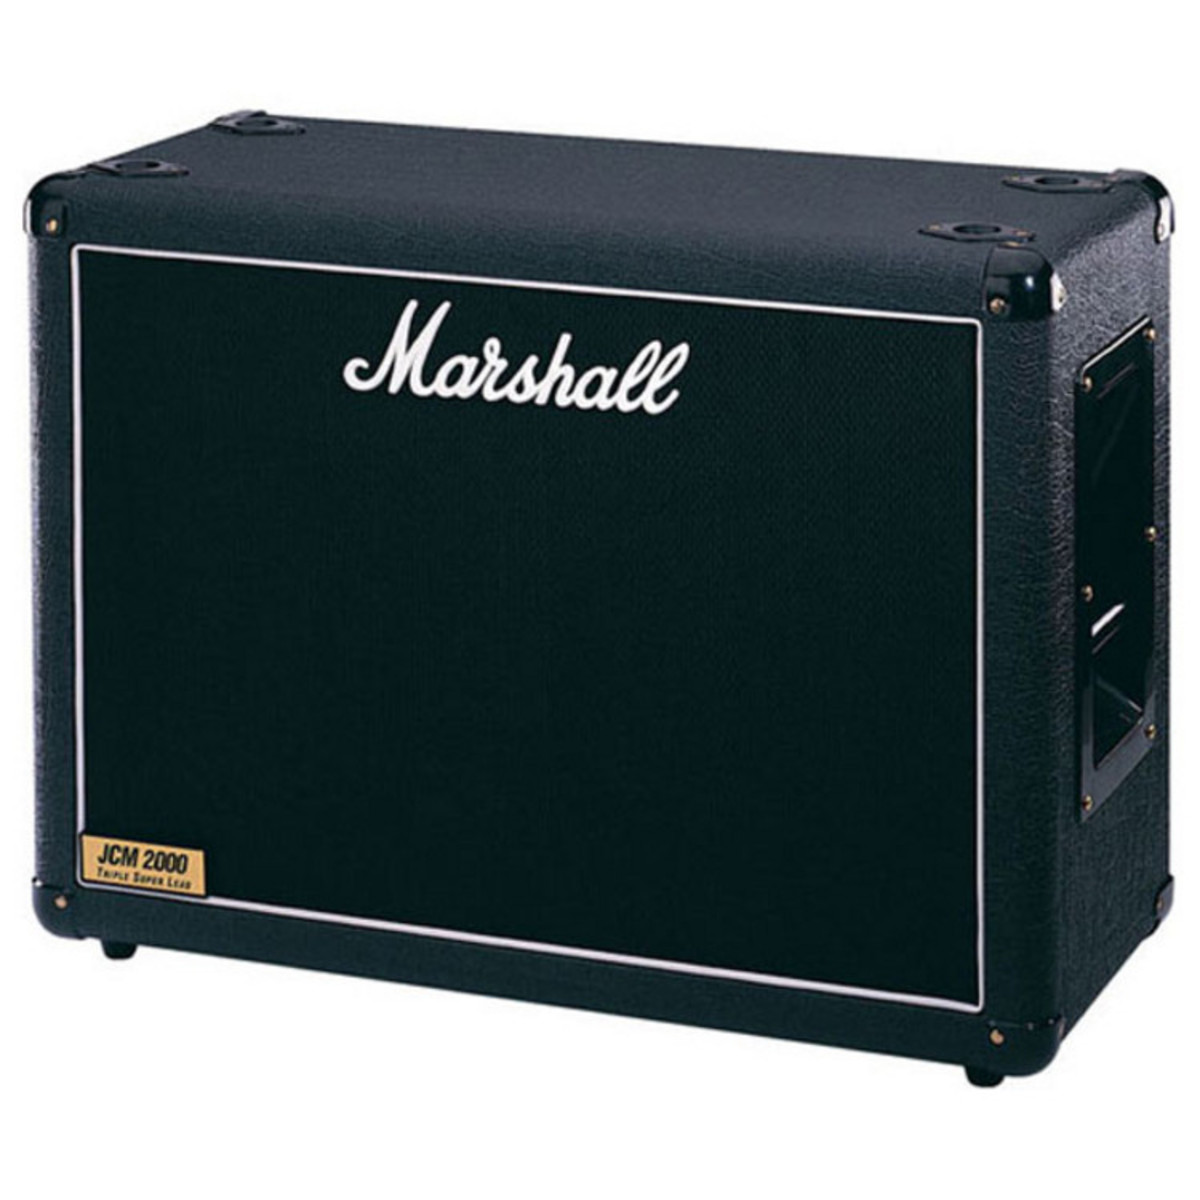 marshall jvmc212 guitar speaker cabinet at gear4music. Black Bedroom Furniture Sets. Home Design Ideas